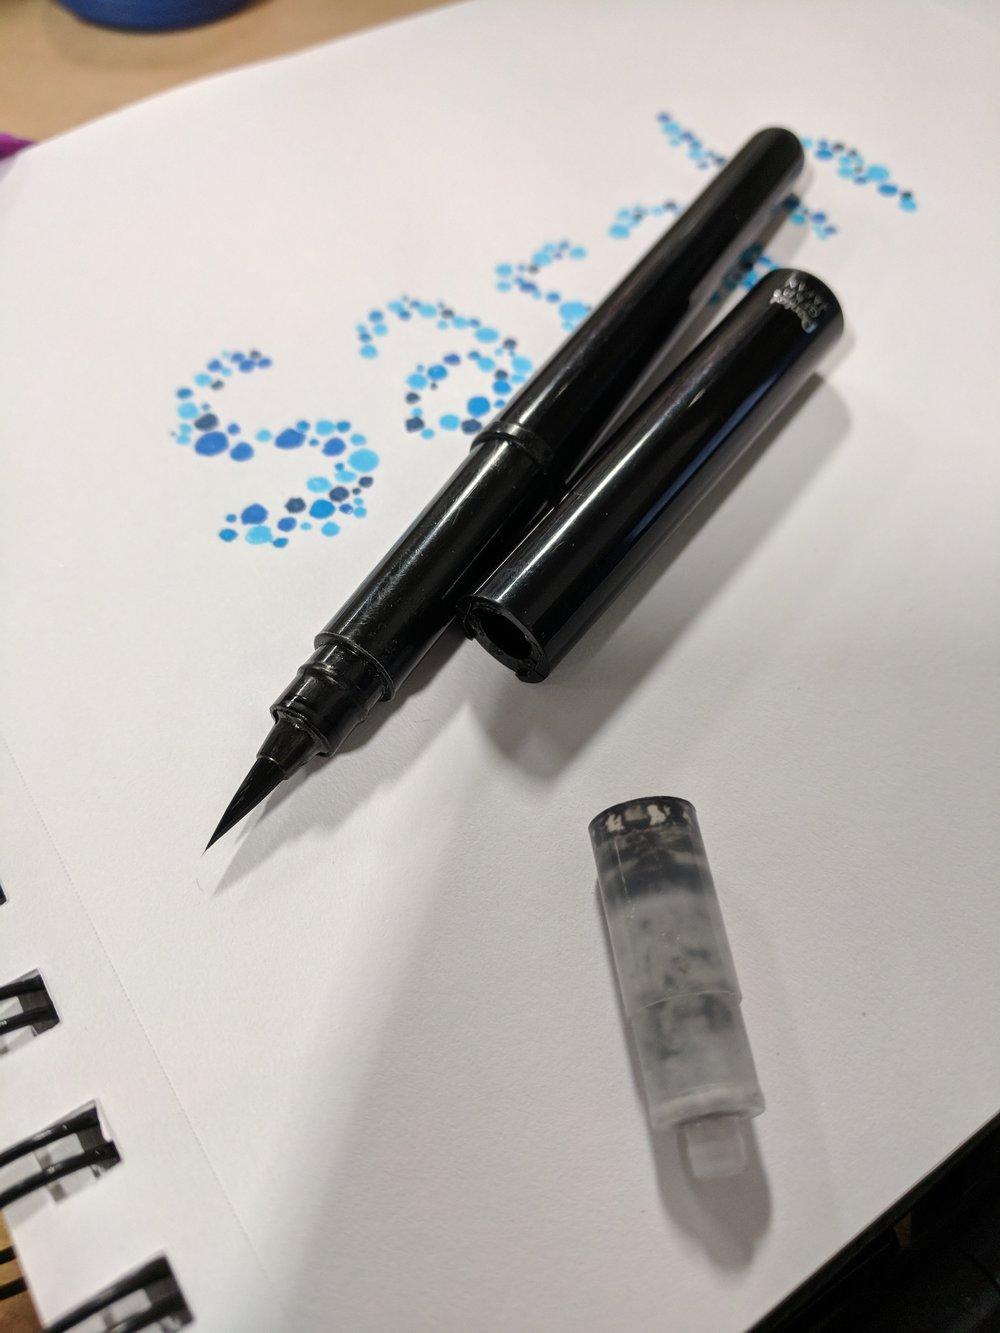 SB_My Favorite Broken Pen.jpg